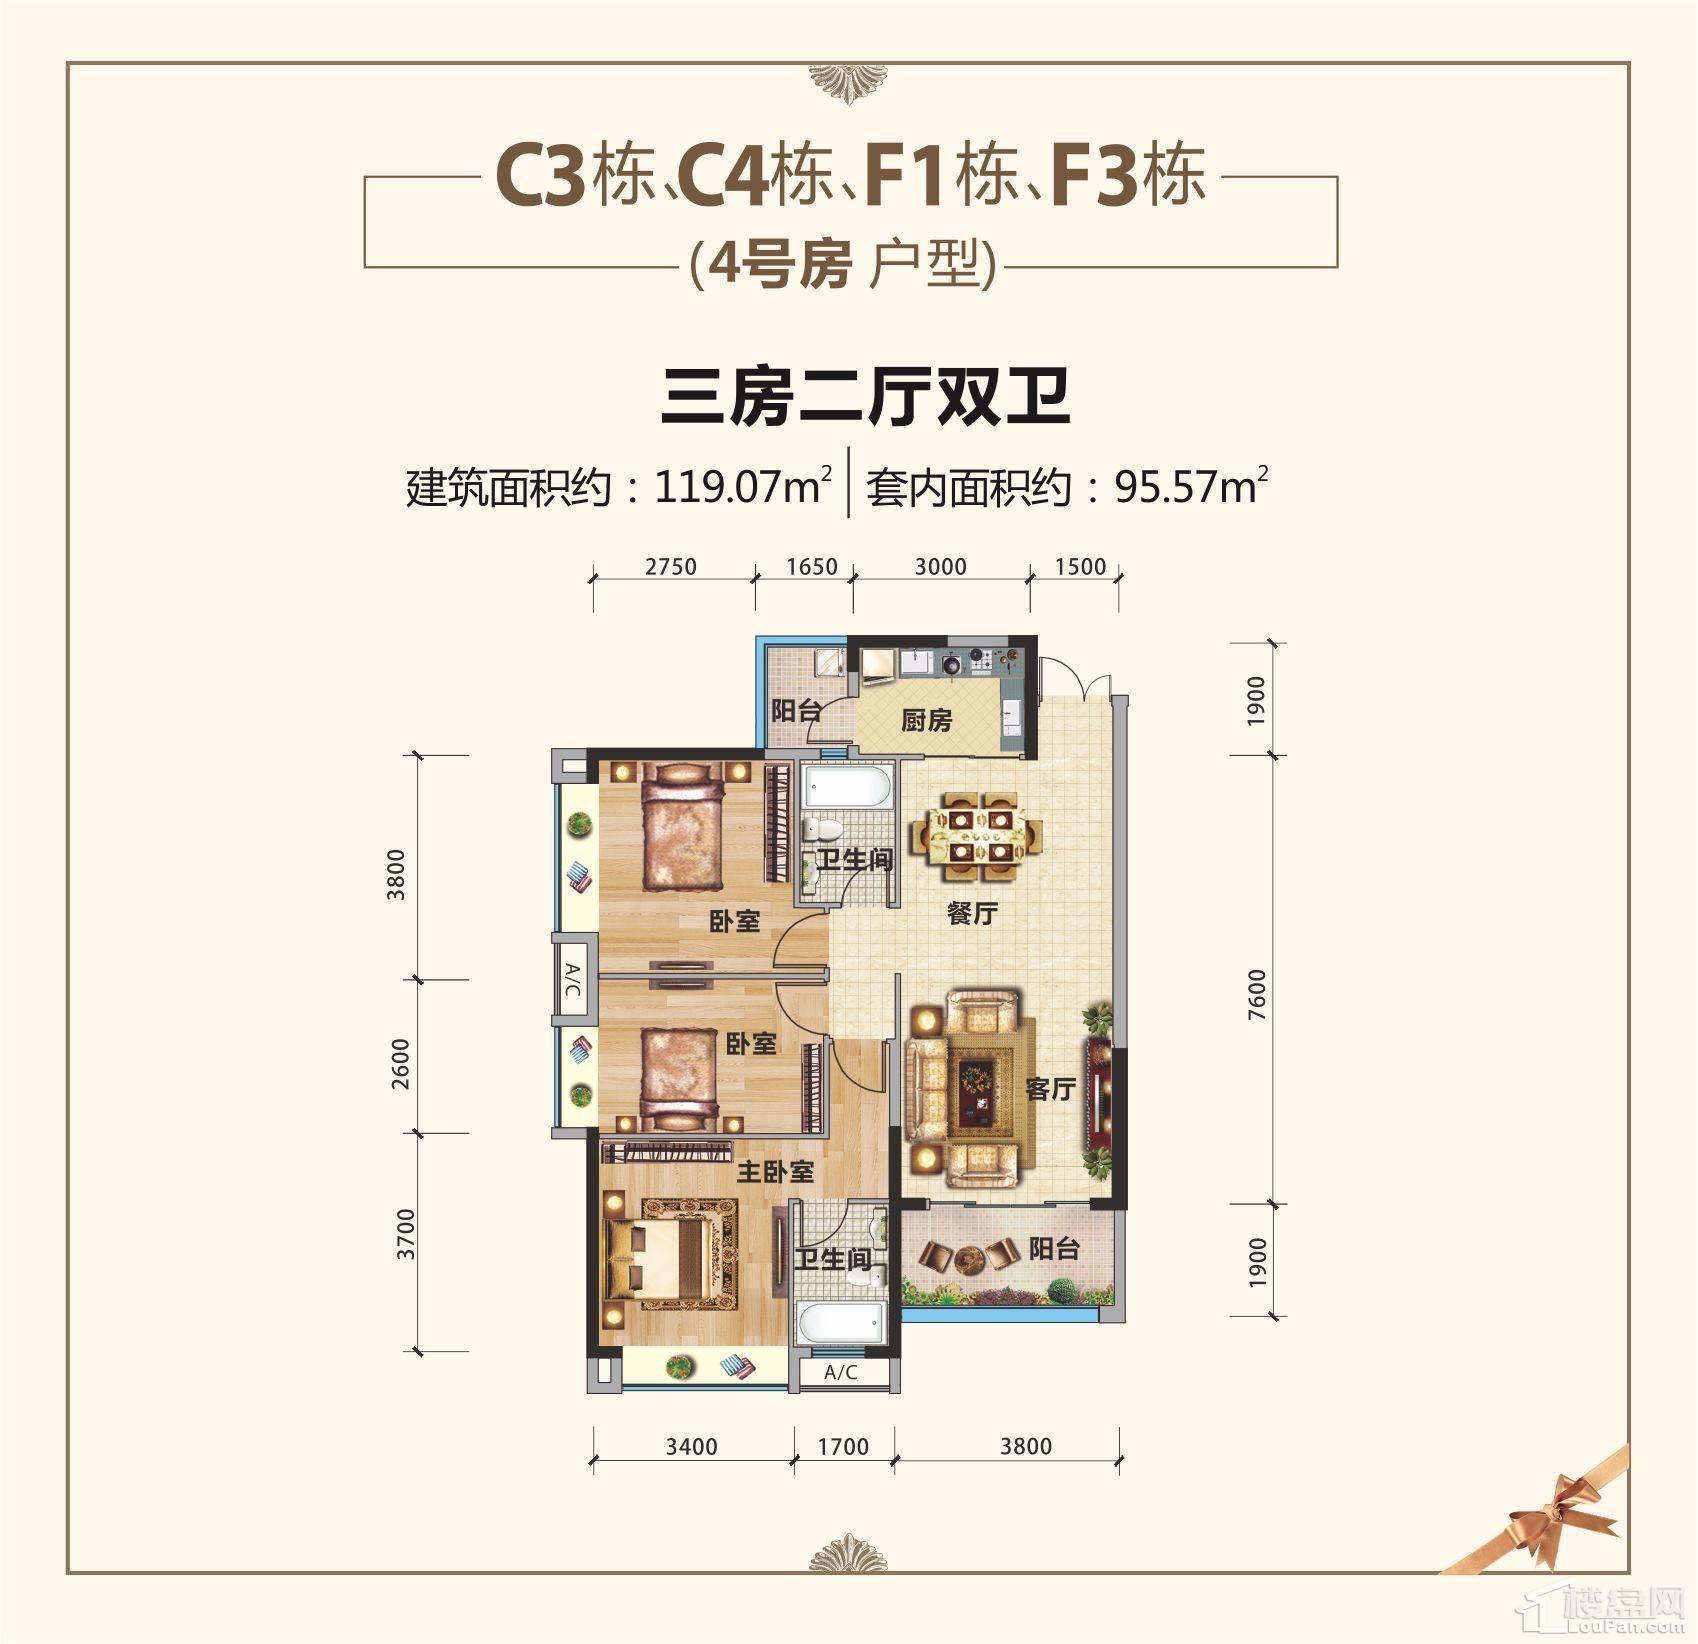 C3栋、C4栋、F1栋、F3栋4号房户型